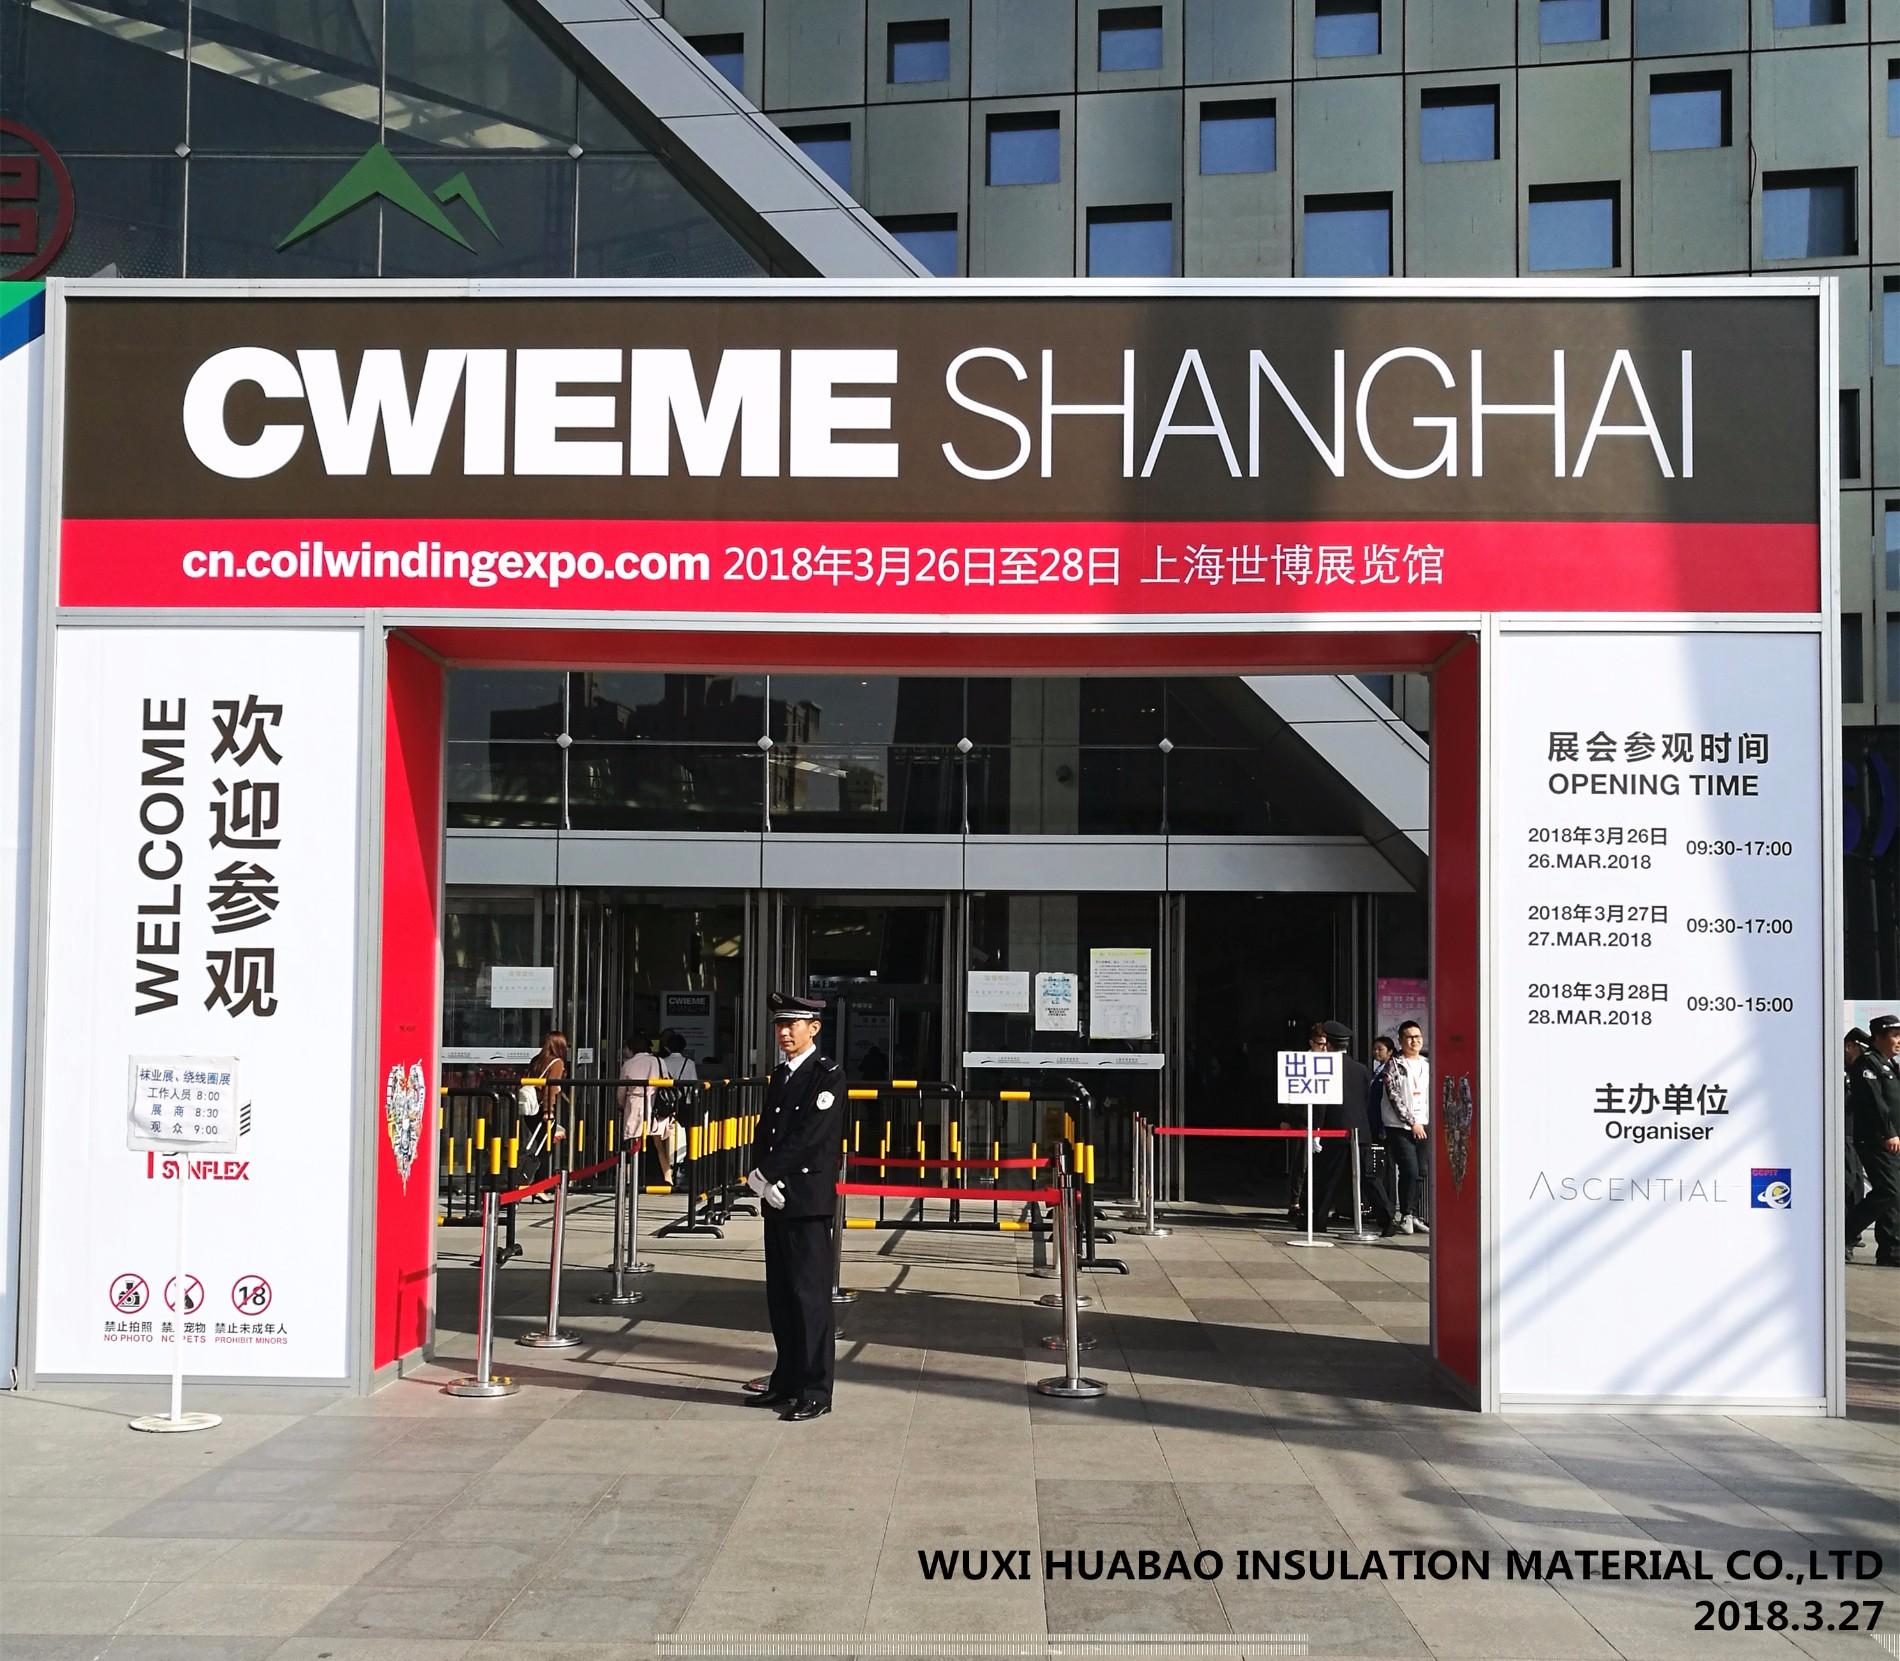 2018 CWIEME SHANGHAI